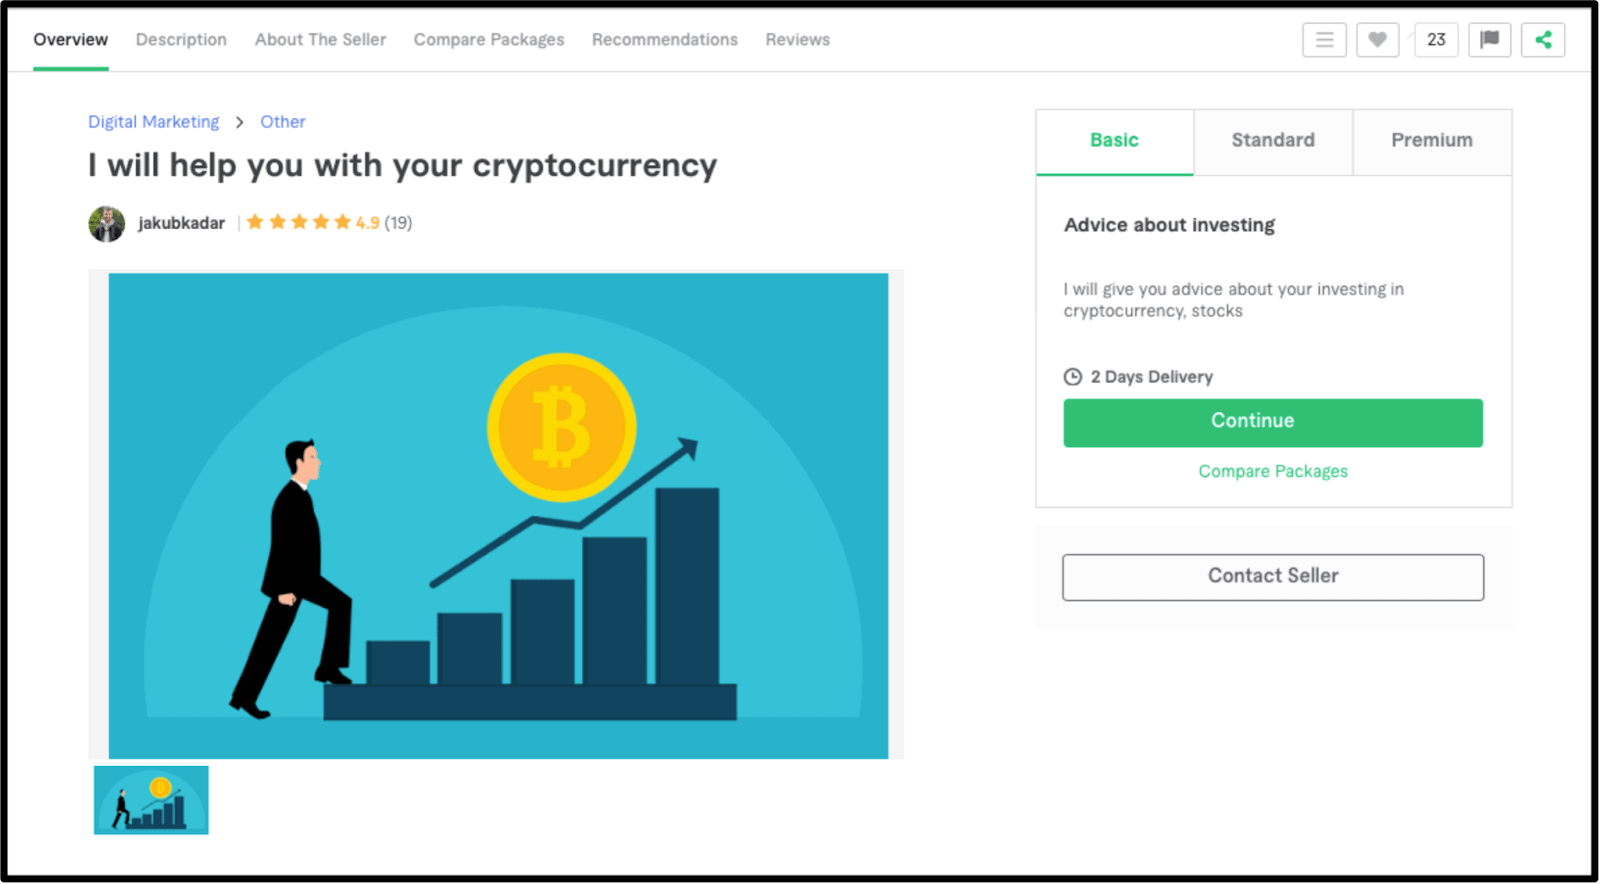 Freelance Bitcoin expert Jakubadar profile on Fiverr